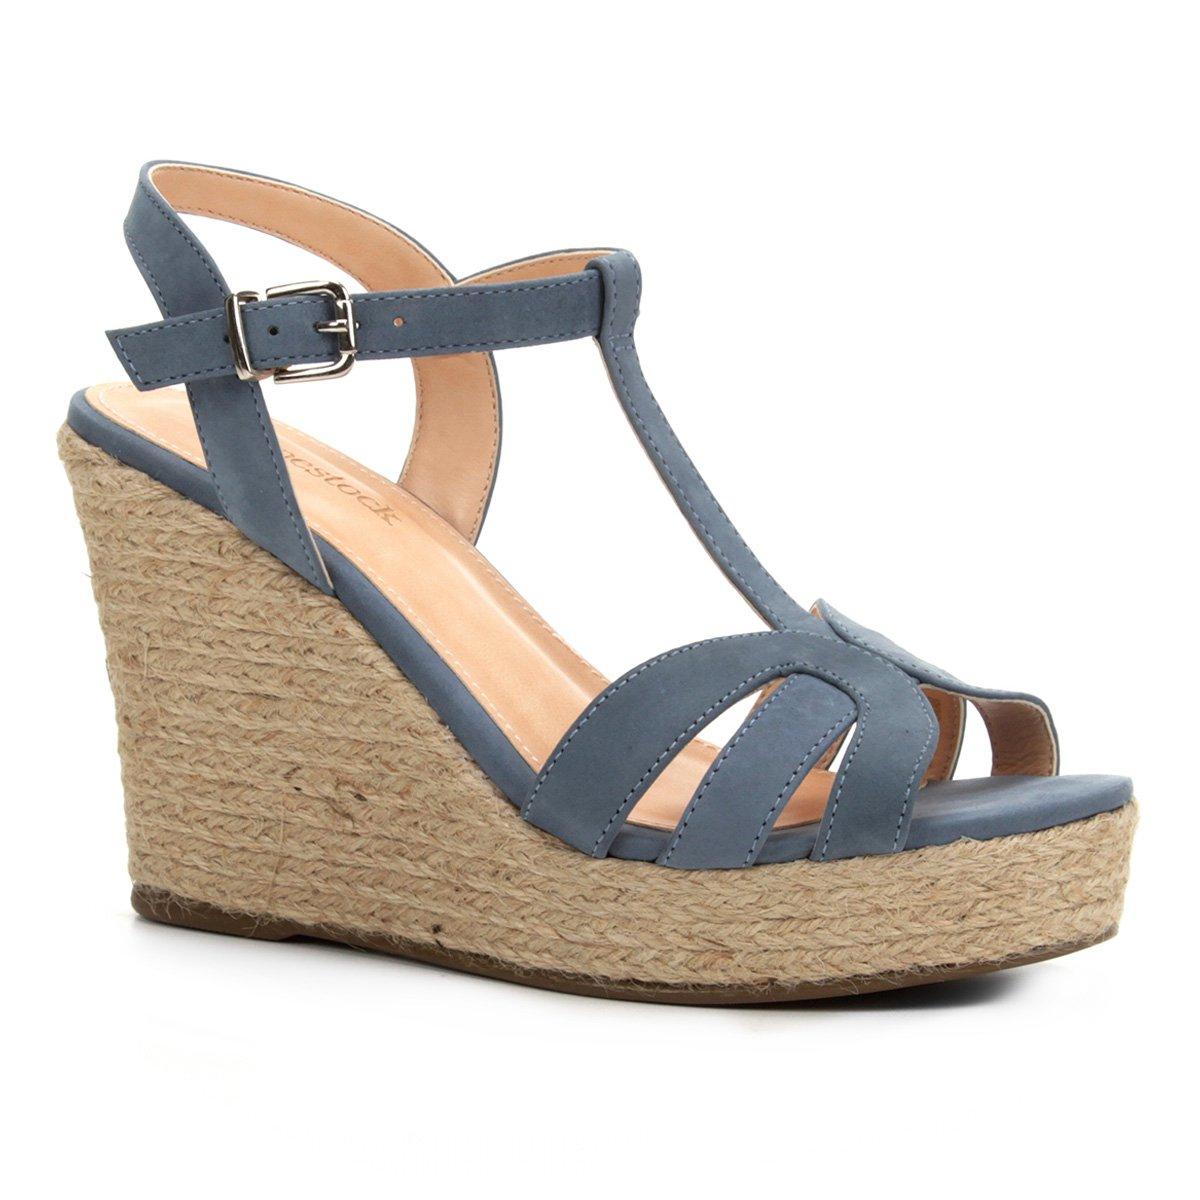 526c83f4e Sandália Plataforma Shoestock Tiras Corda Feminina - Azul | Shoestock